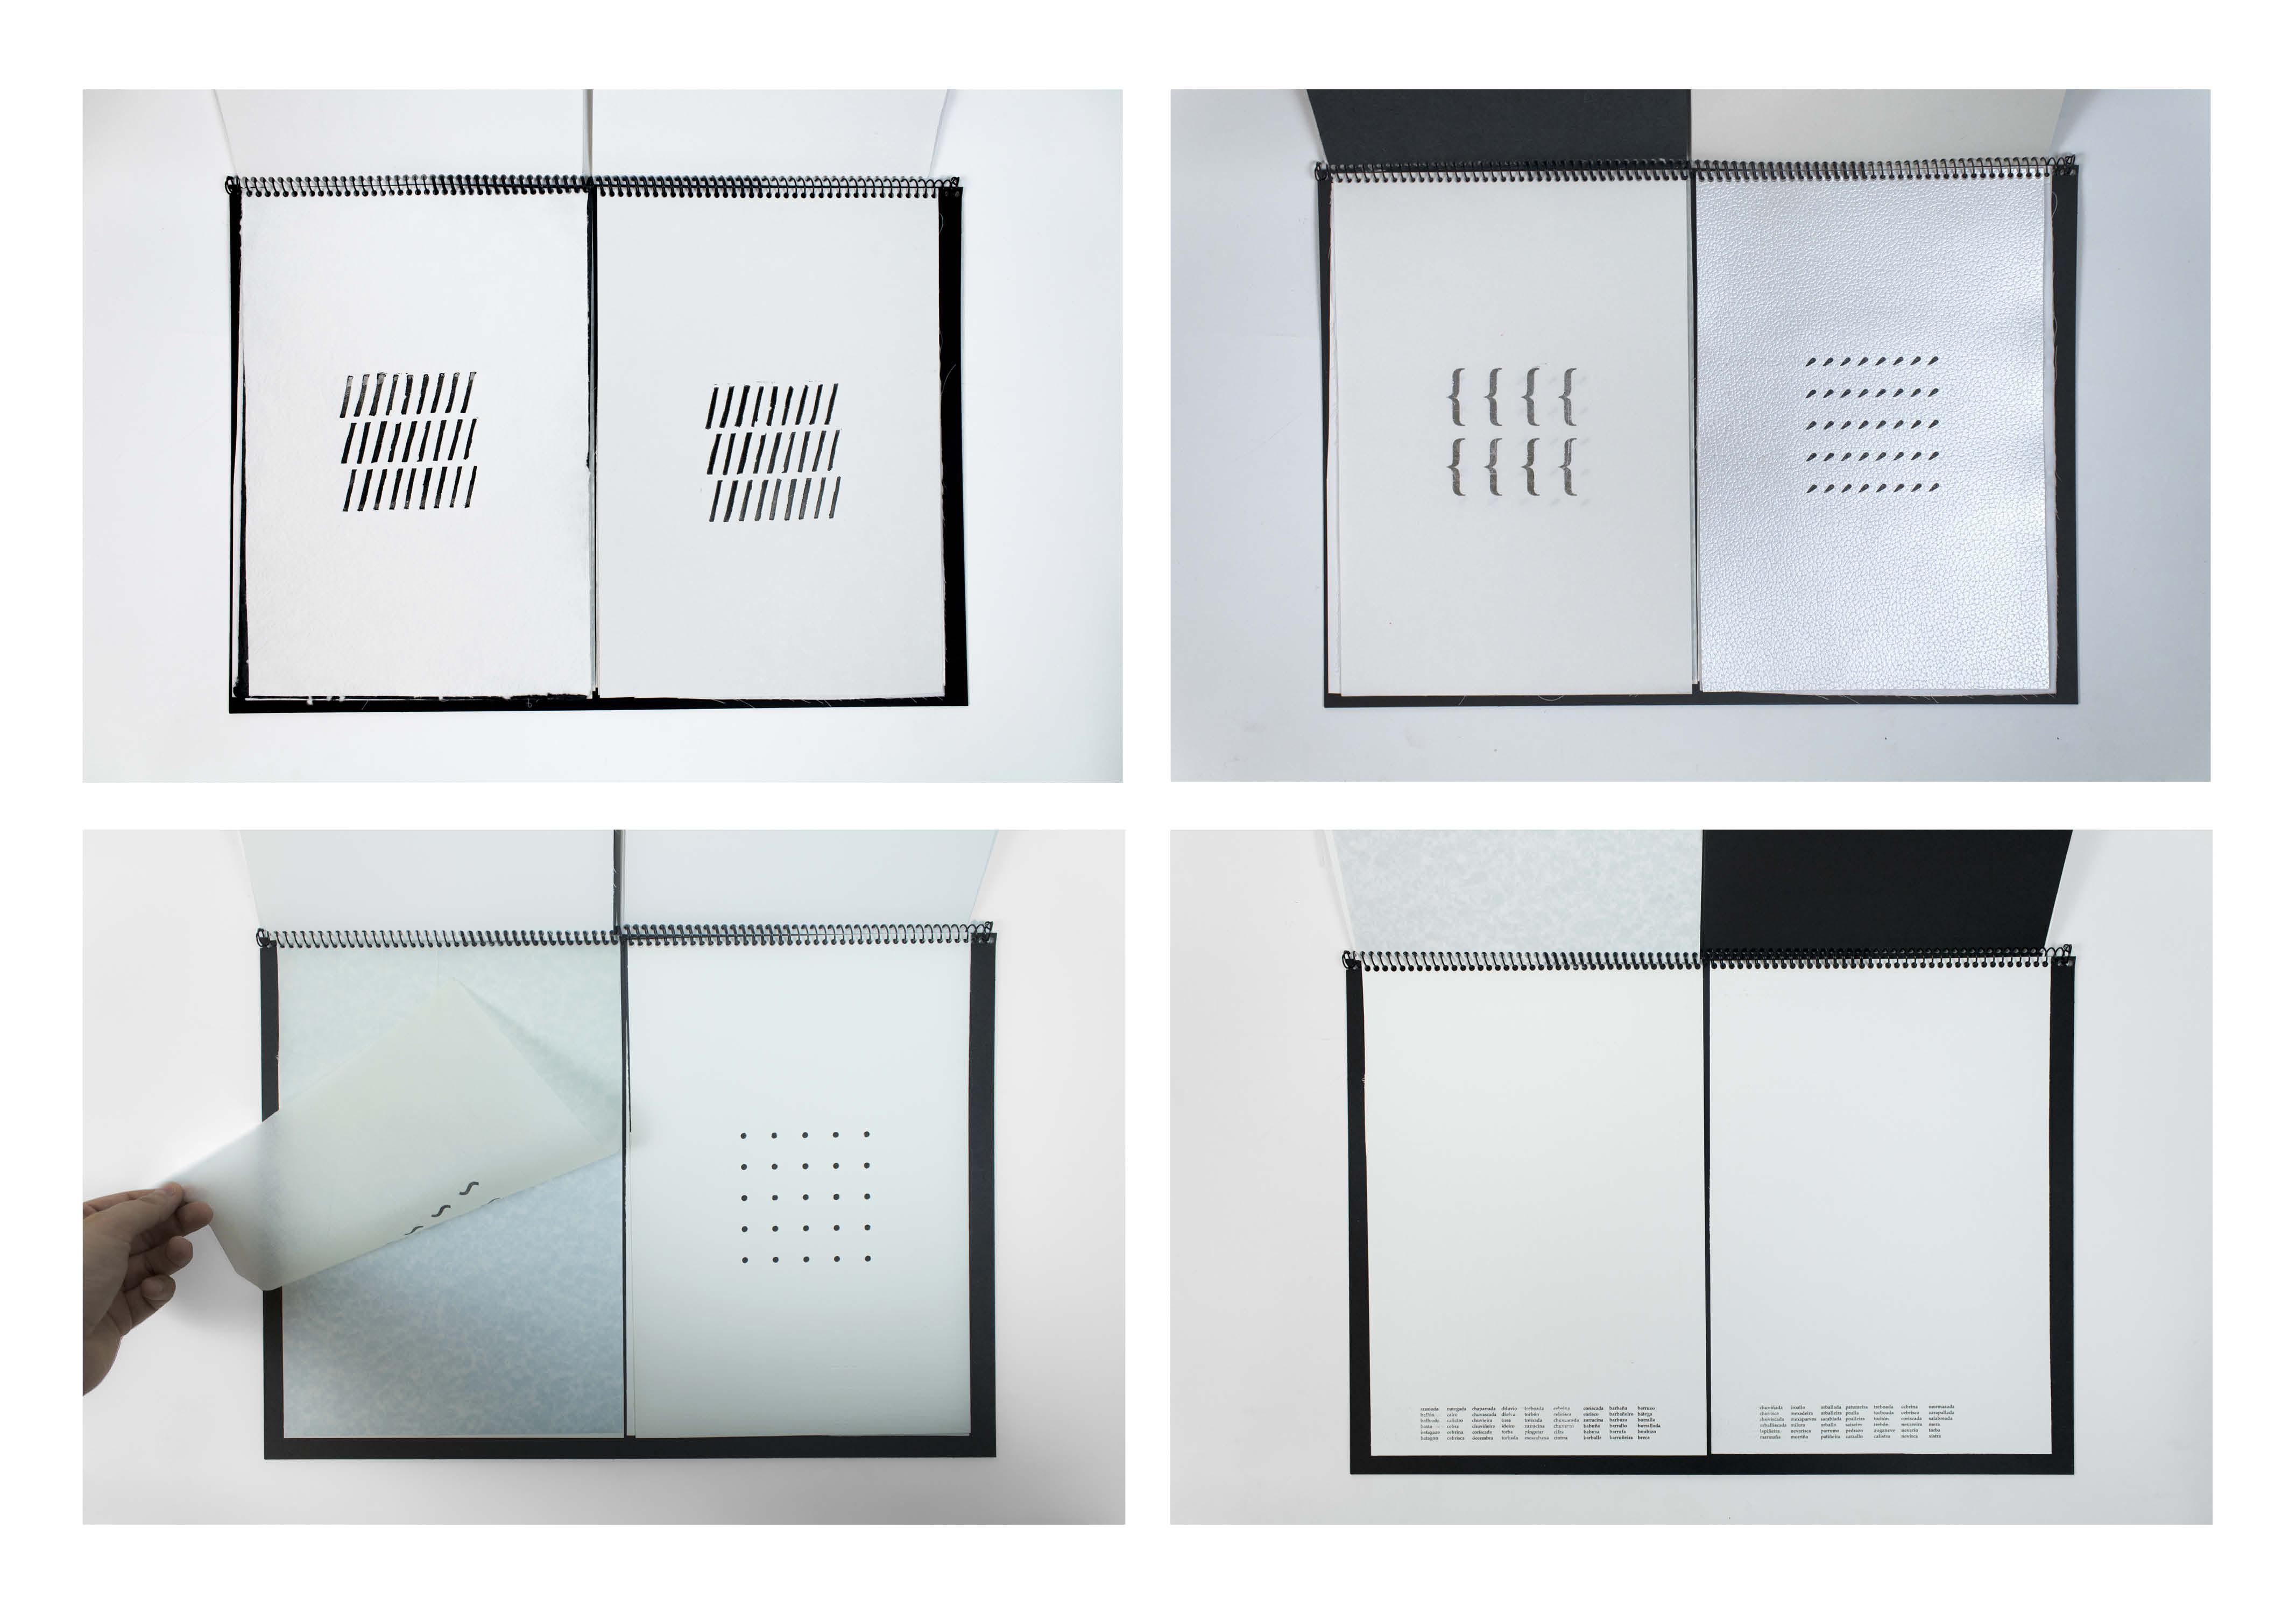 Te lo voy a contar con... 'choiva' by Natalia Lareo Rodríguez - Creative Work - $i